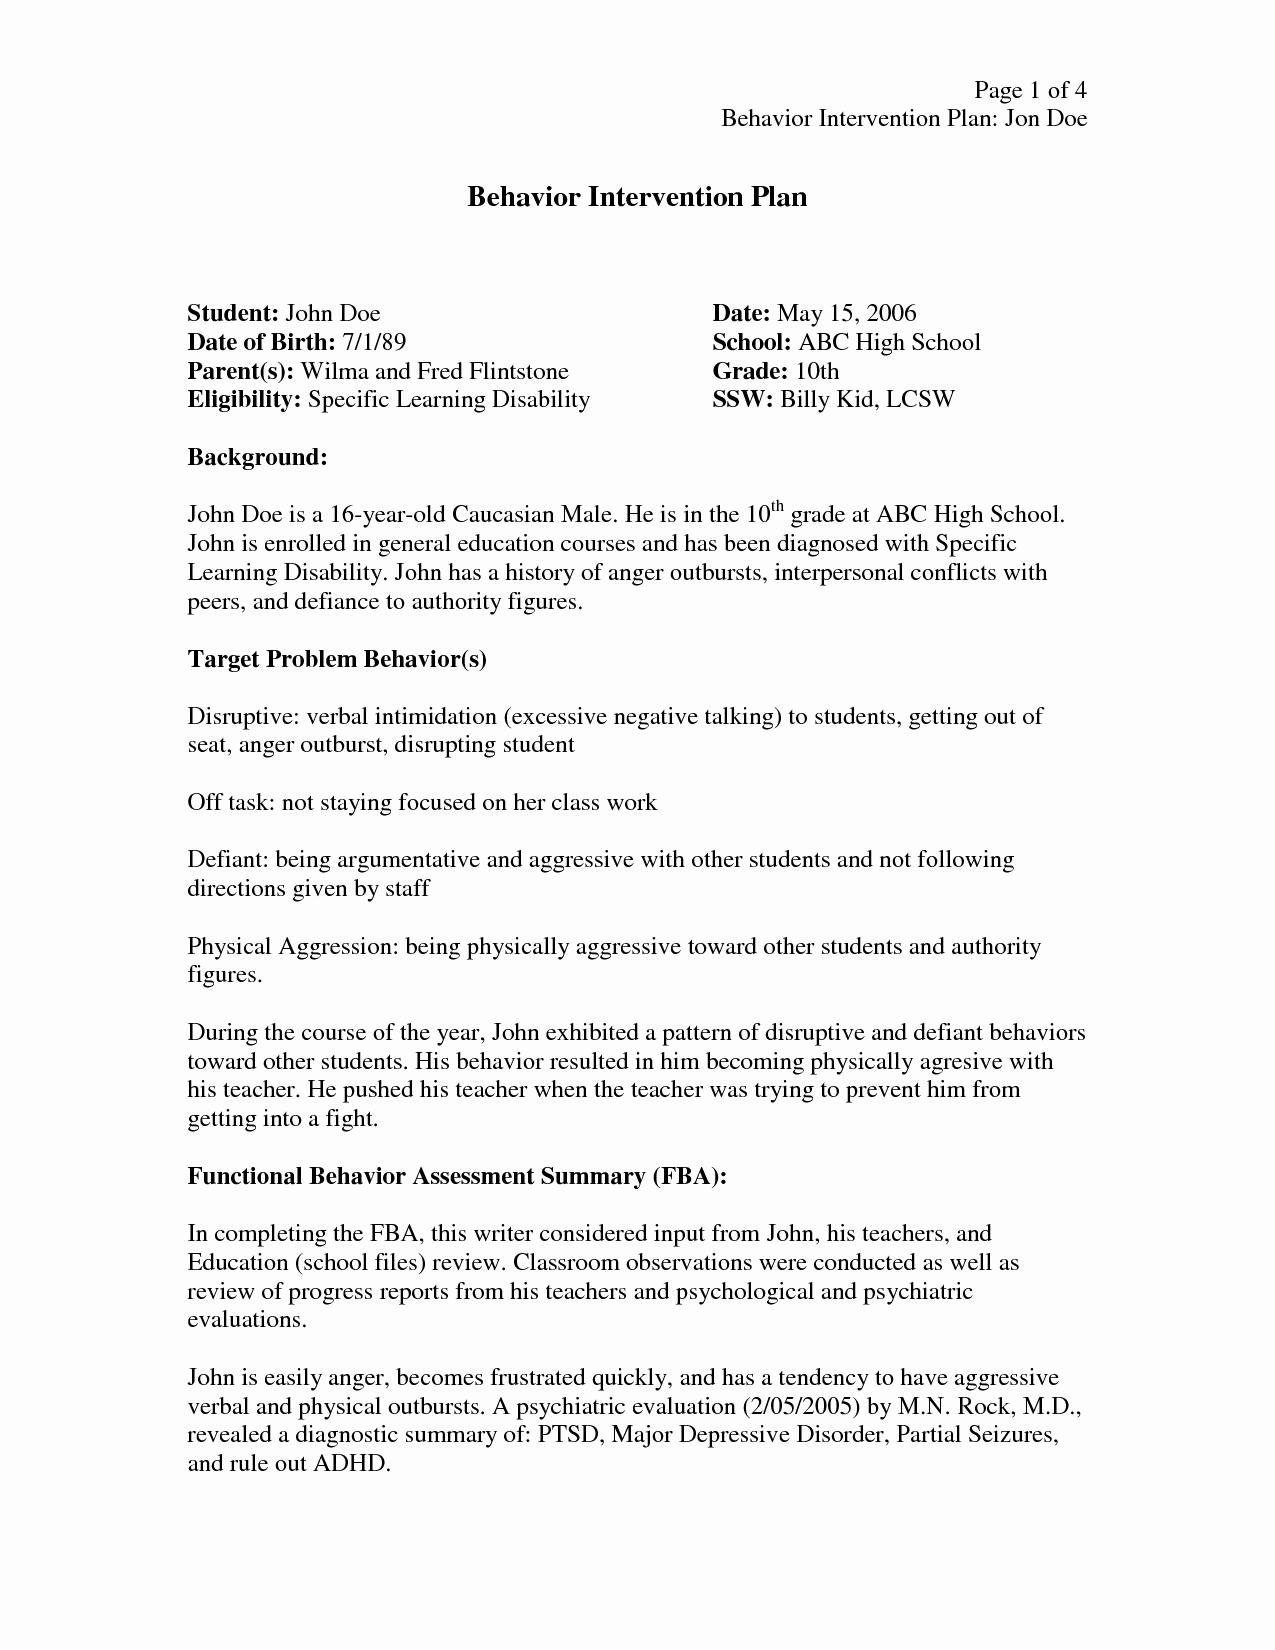 Behavior Intervention Plan Template New Behavior Intervention Plan Template